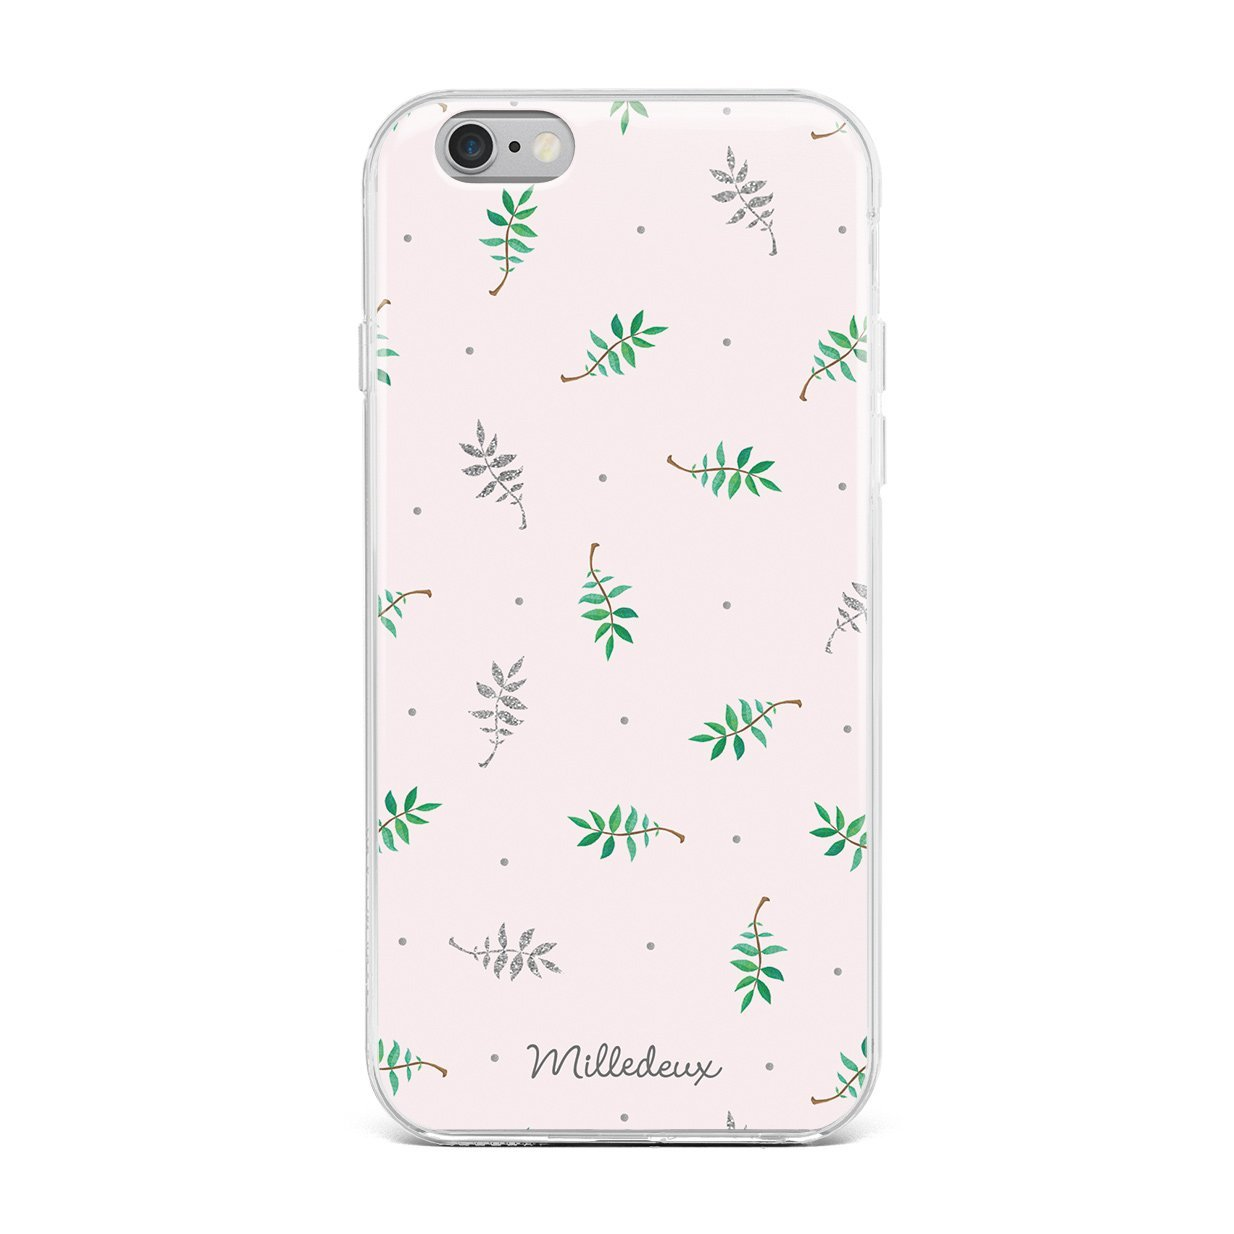 Milledeux Iphone Cover 6 6s 7 8 Plus Glitter Pattern